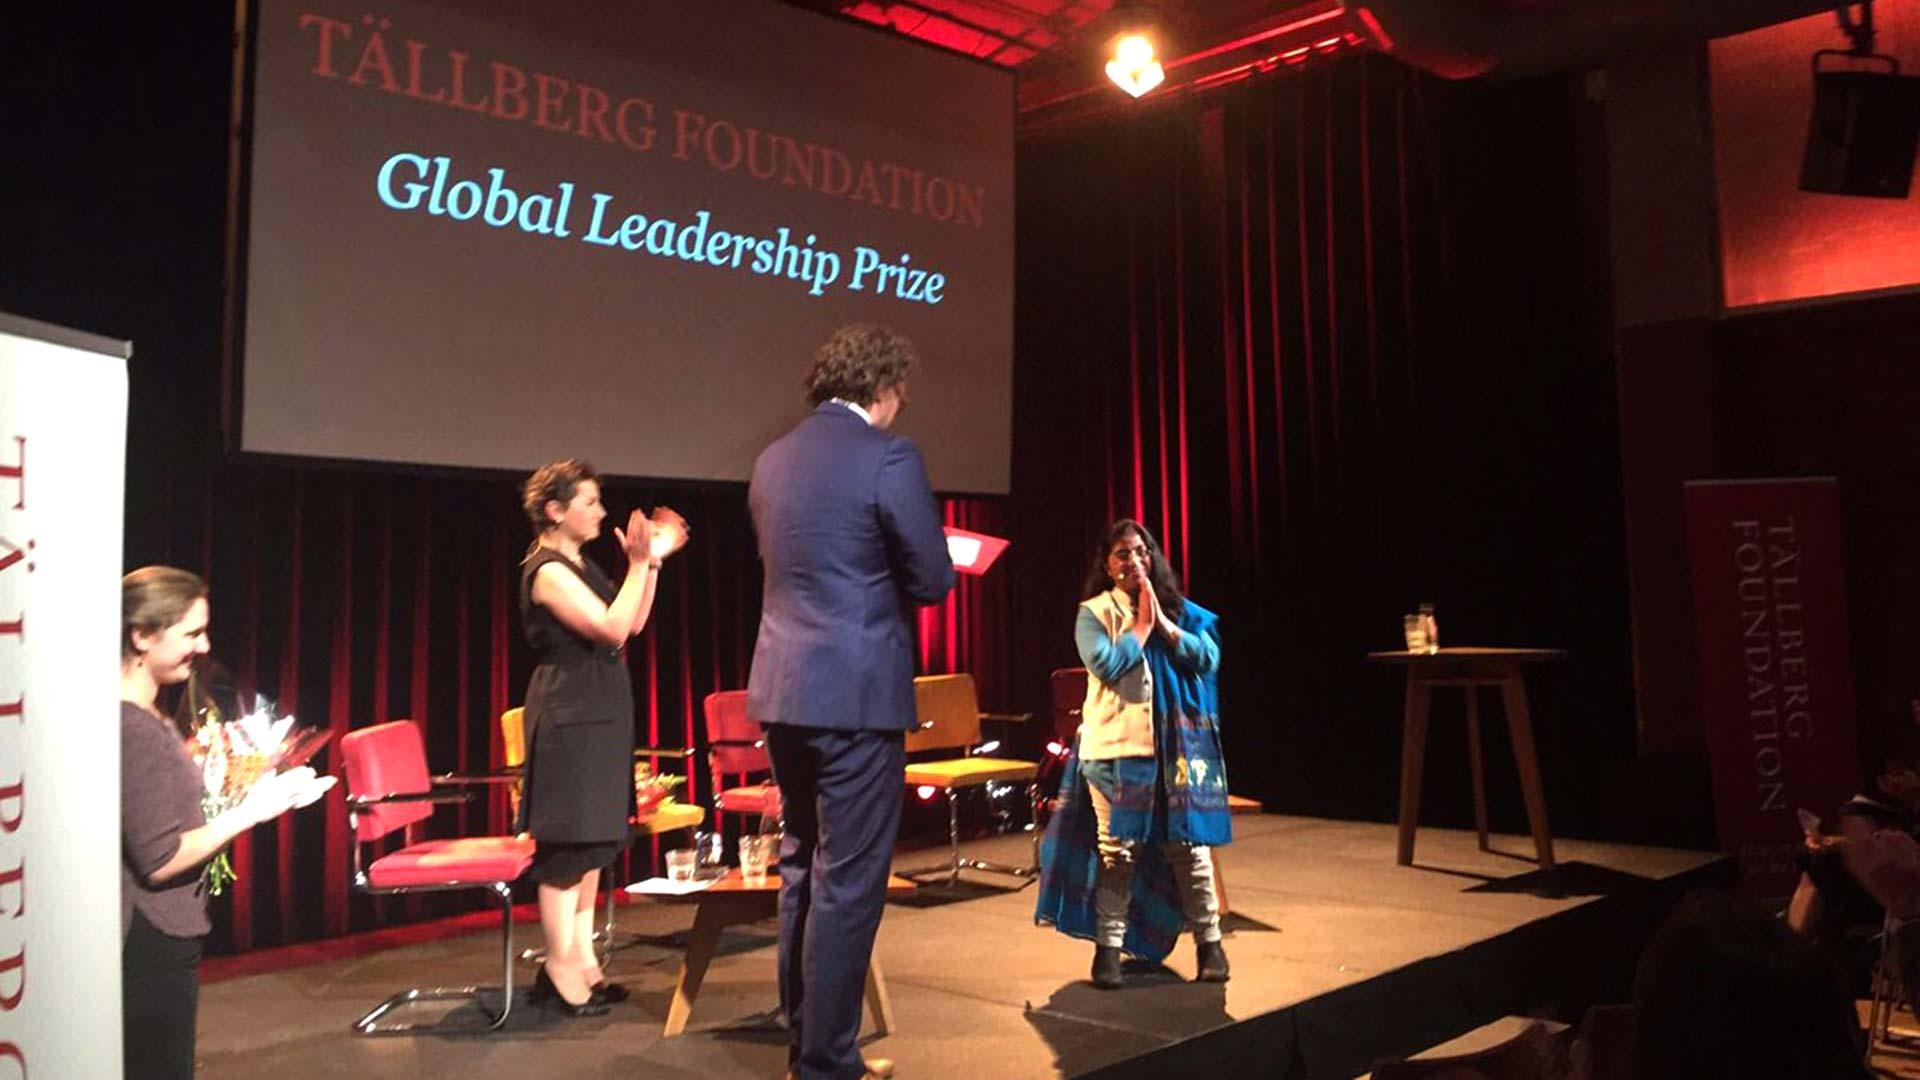 Tallberg Foundation Debate